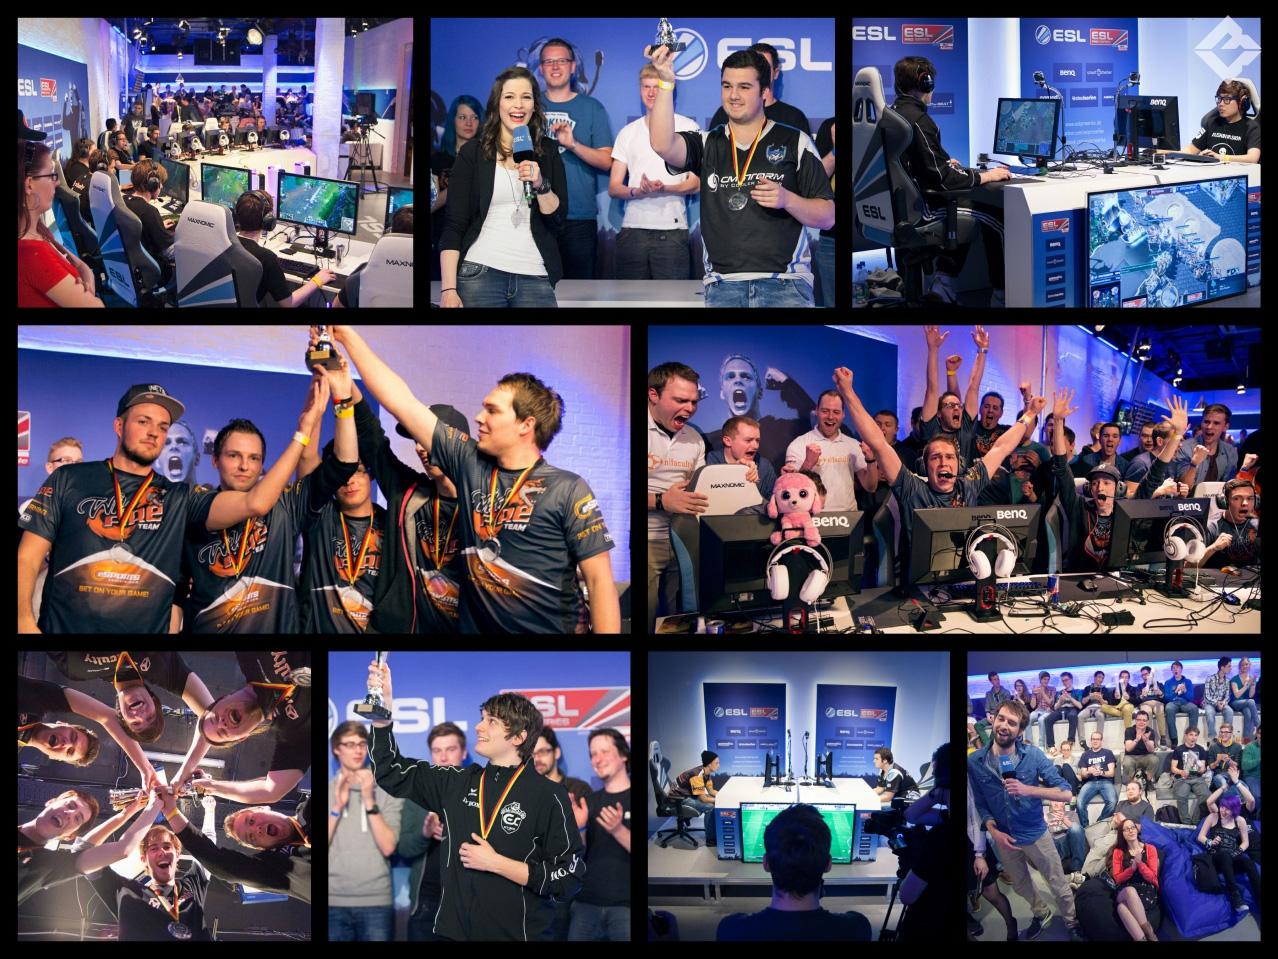 Planetkey Dynamics чемпионы Германии по CS:GO